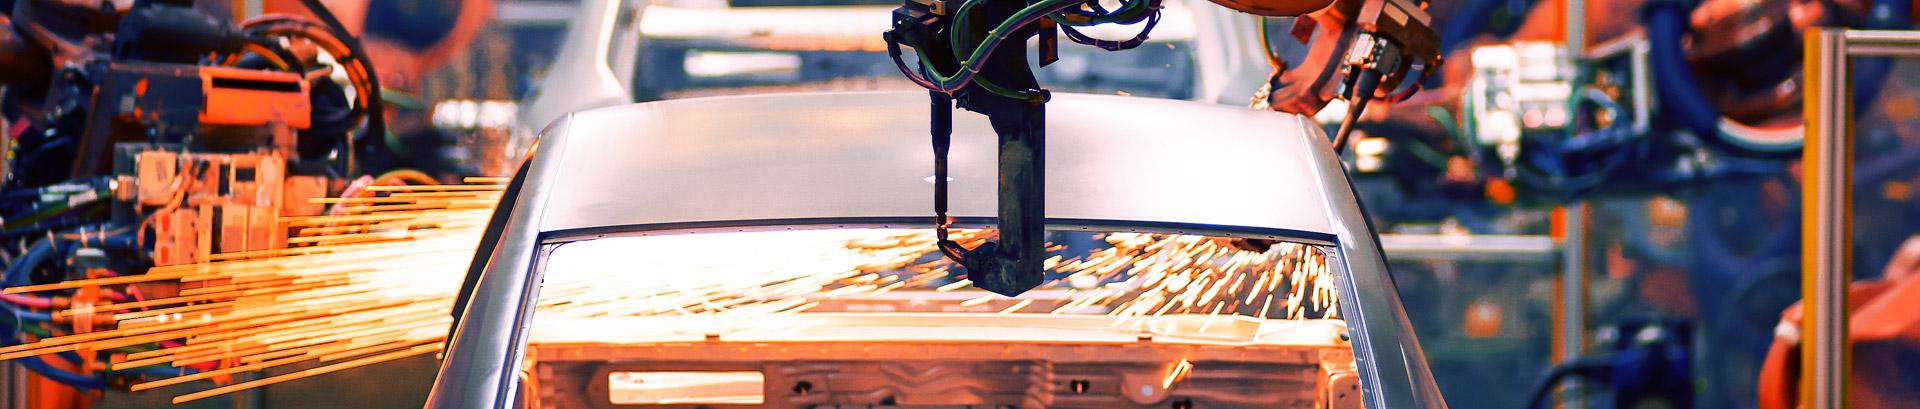 connectors for welding tools